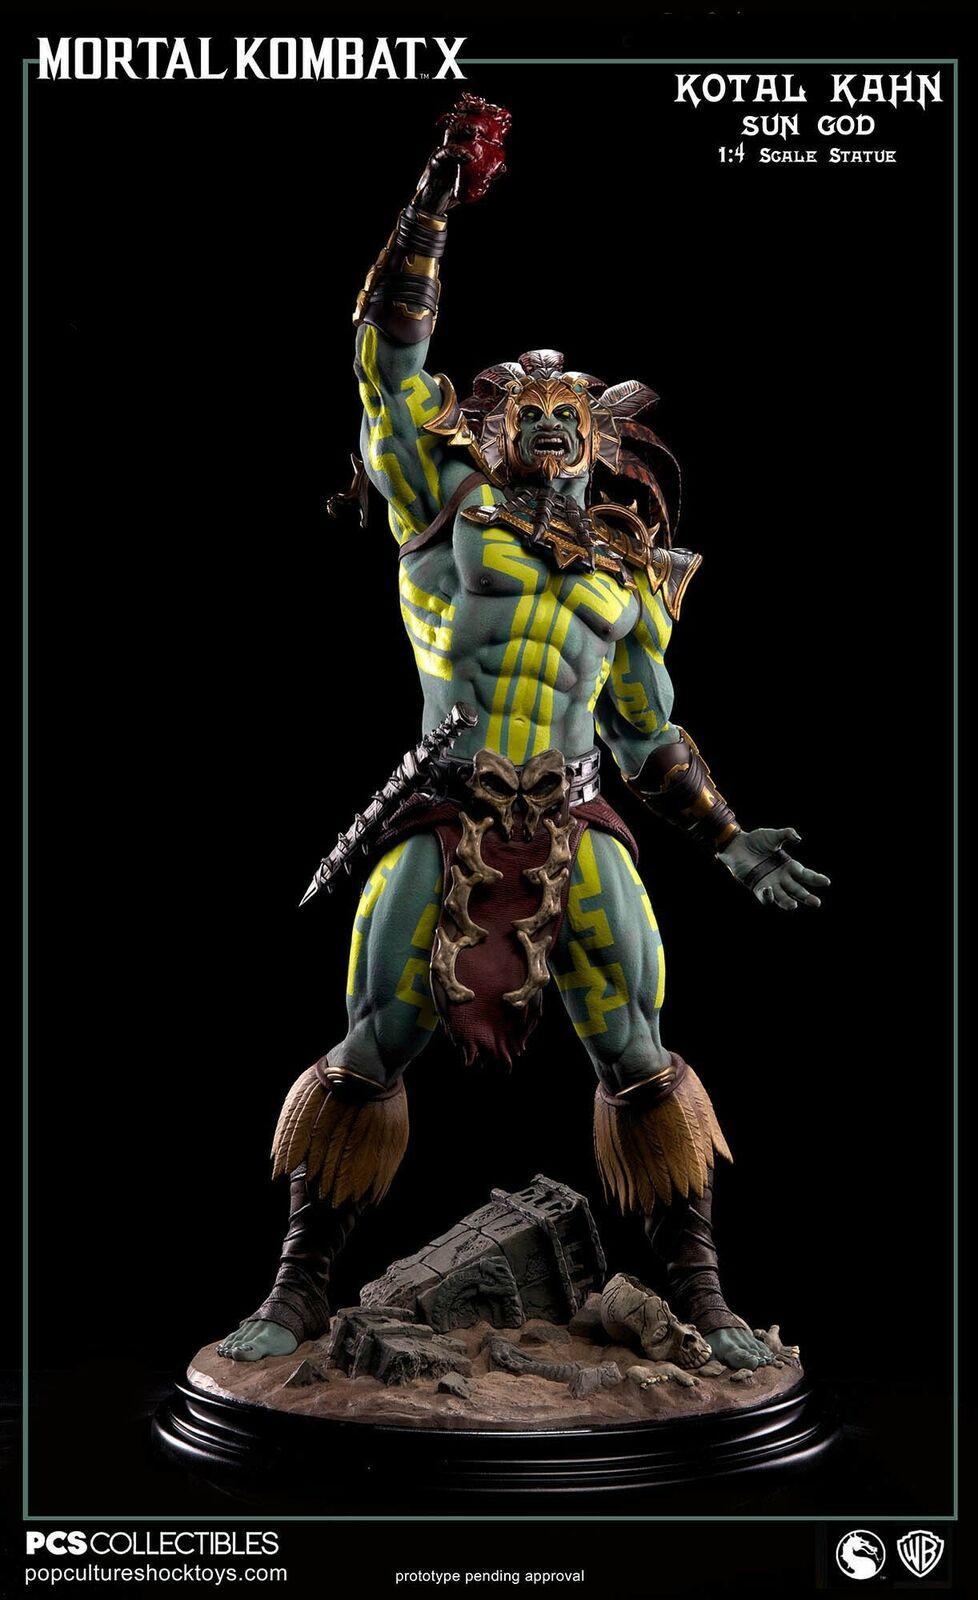 Mortal Kombat X Kotal Kahn Sun God 1 4 Statue 69 cm Pop Culture Shock